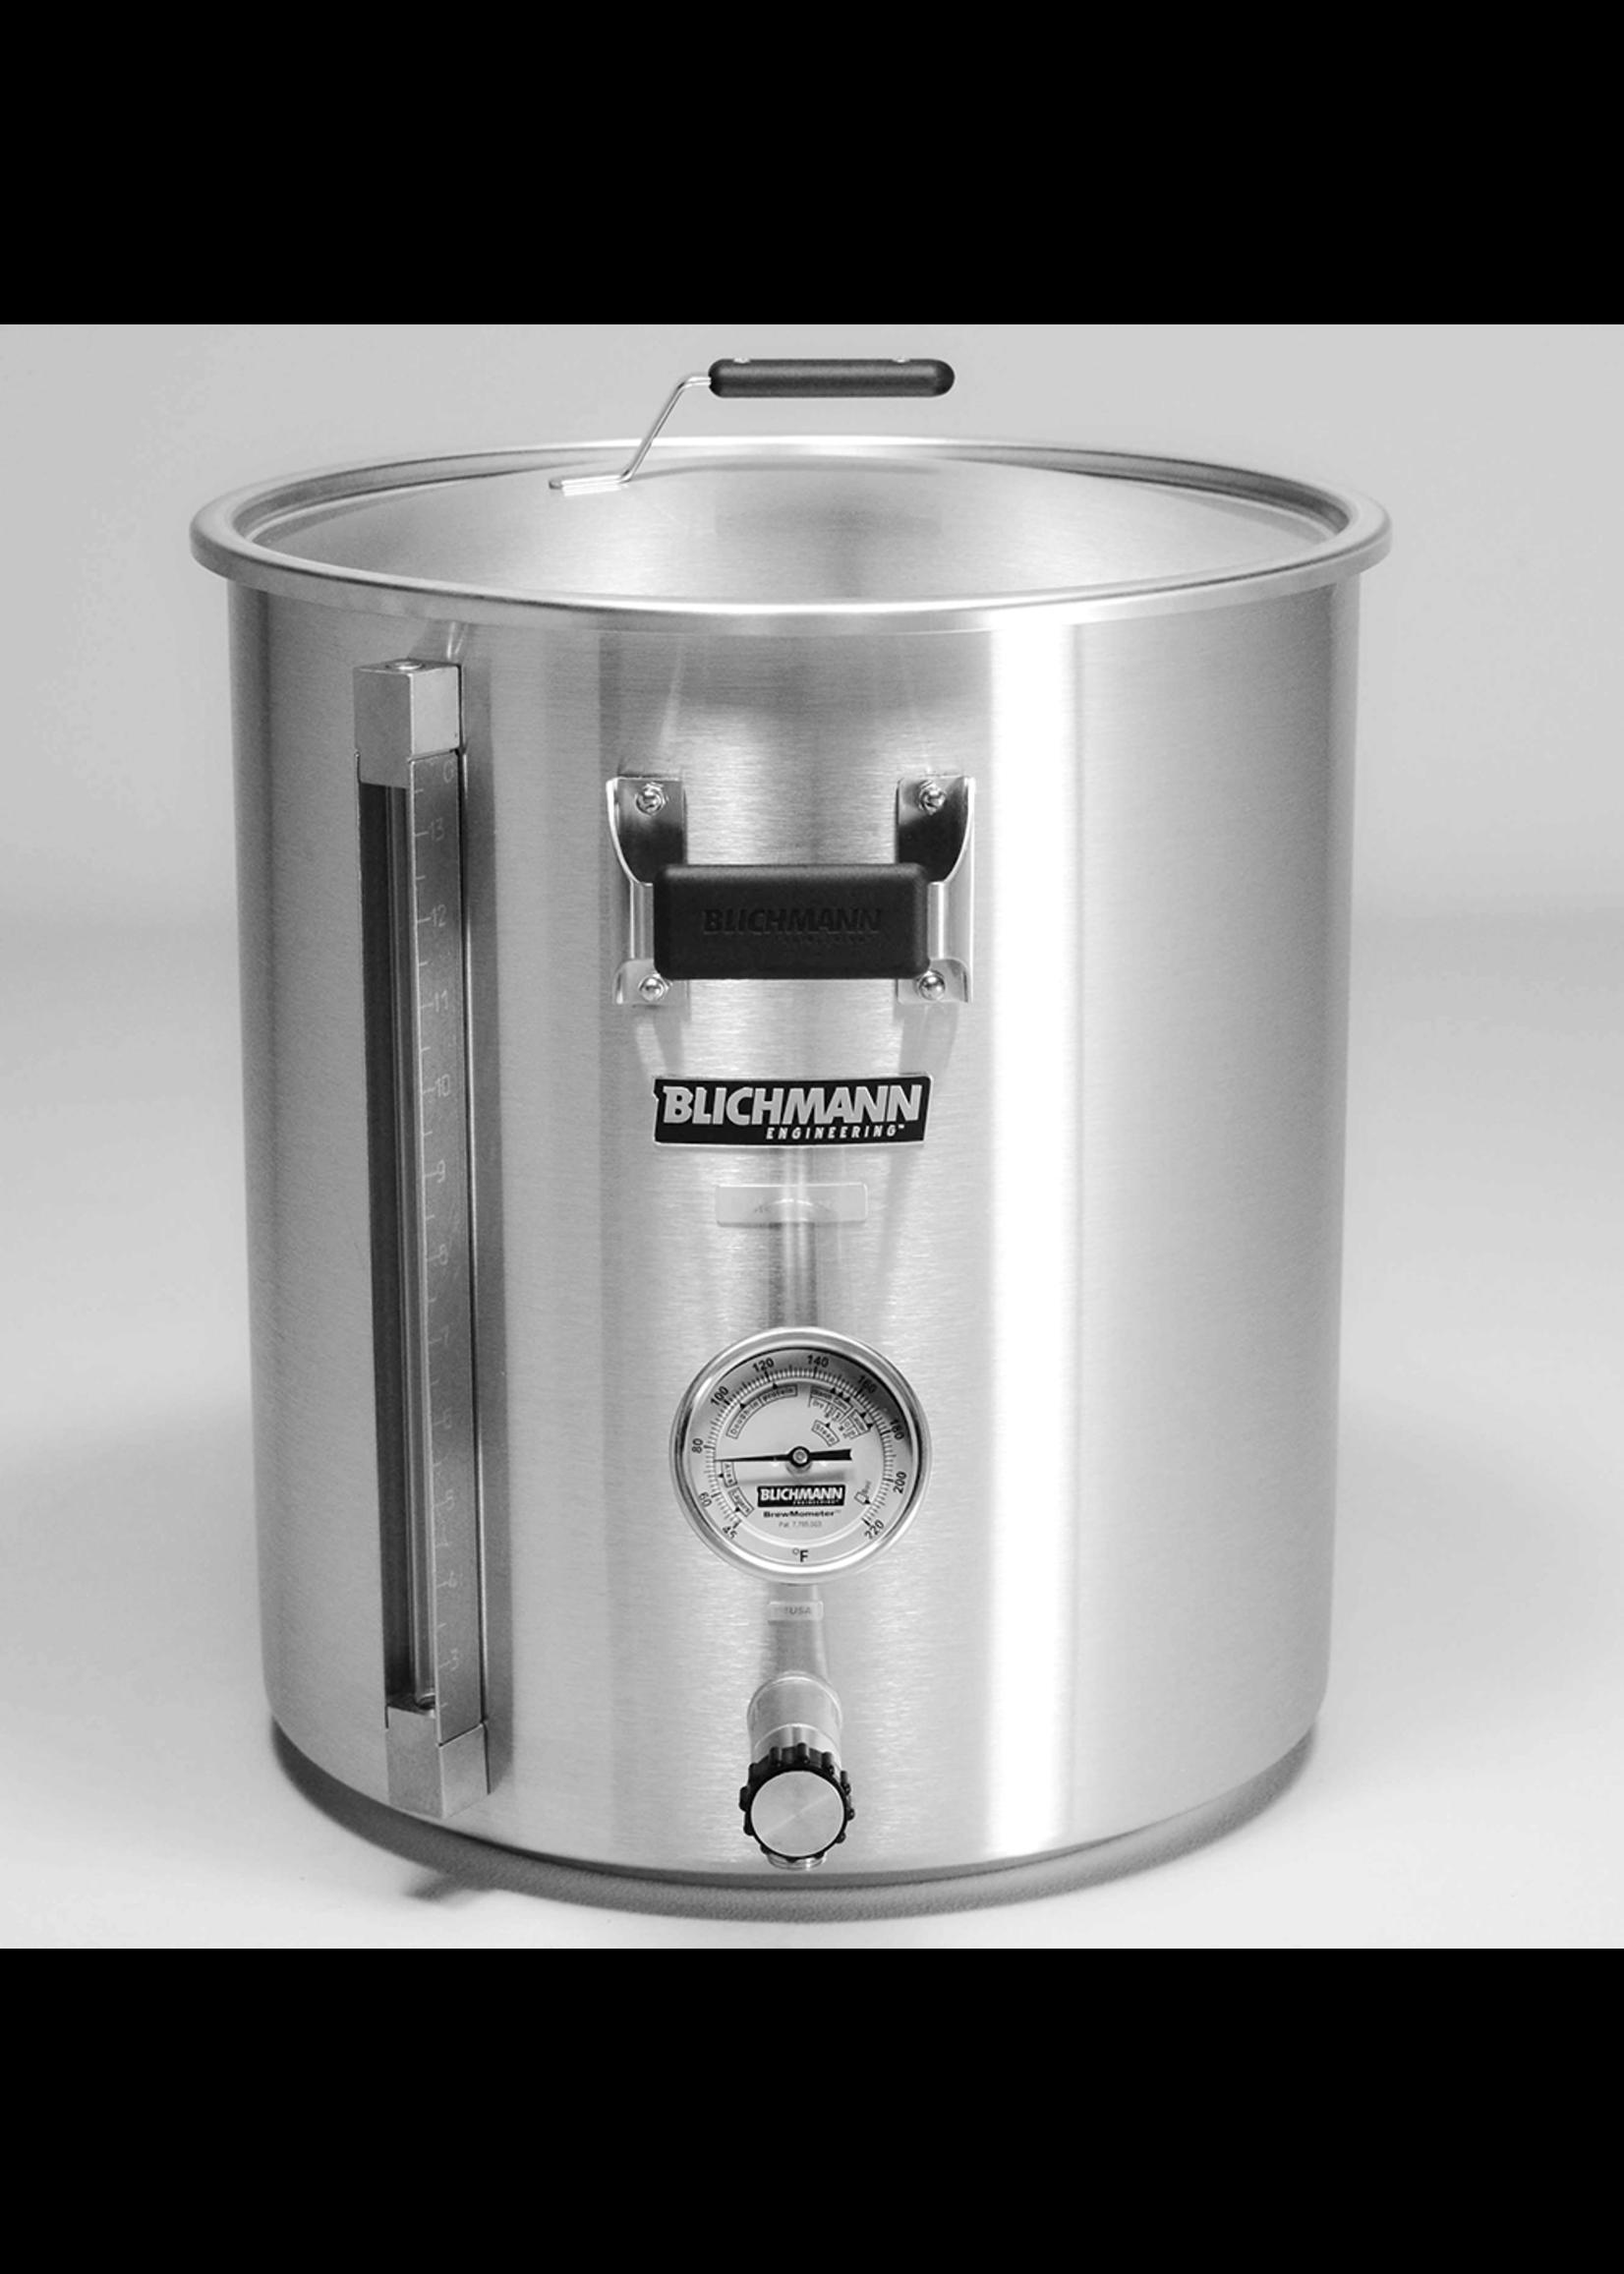 Blichmann Blichmann BoilerMaker G2 - 55 Gallon Standard Brew Kettle (Celsius)